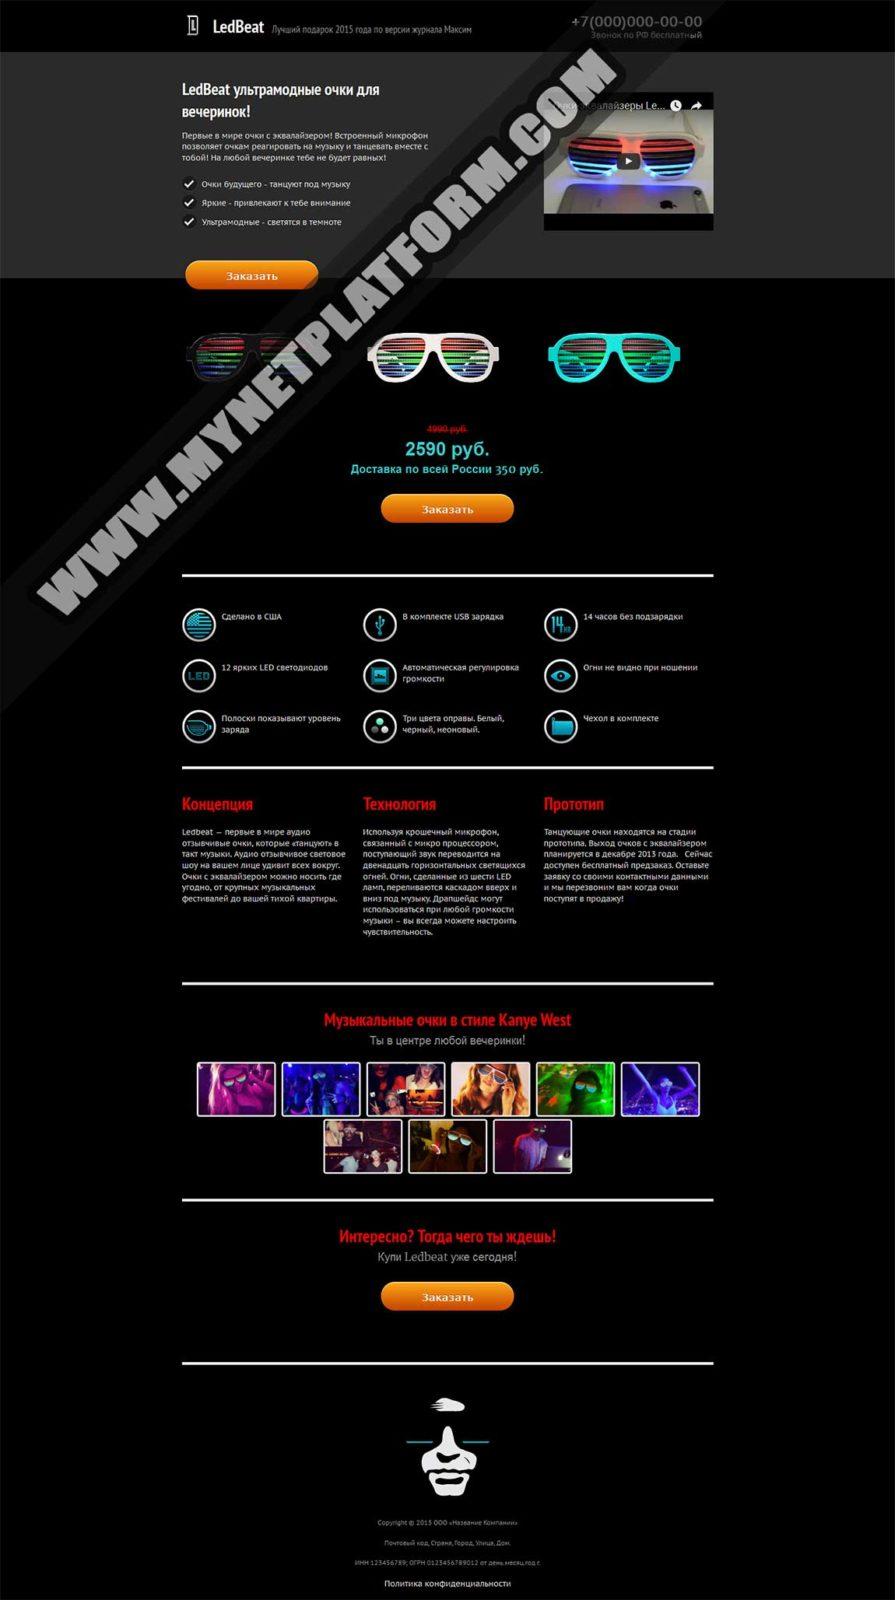 Скриншот лендинга Ledbeat - очки с эквалайзером 001